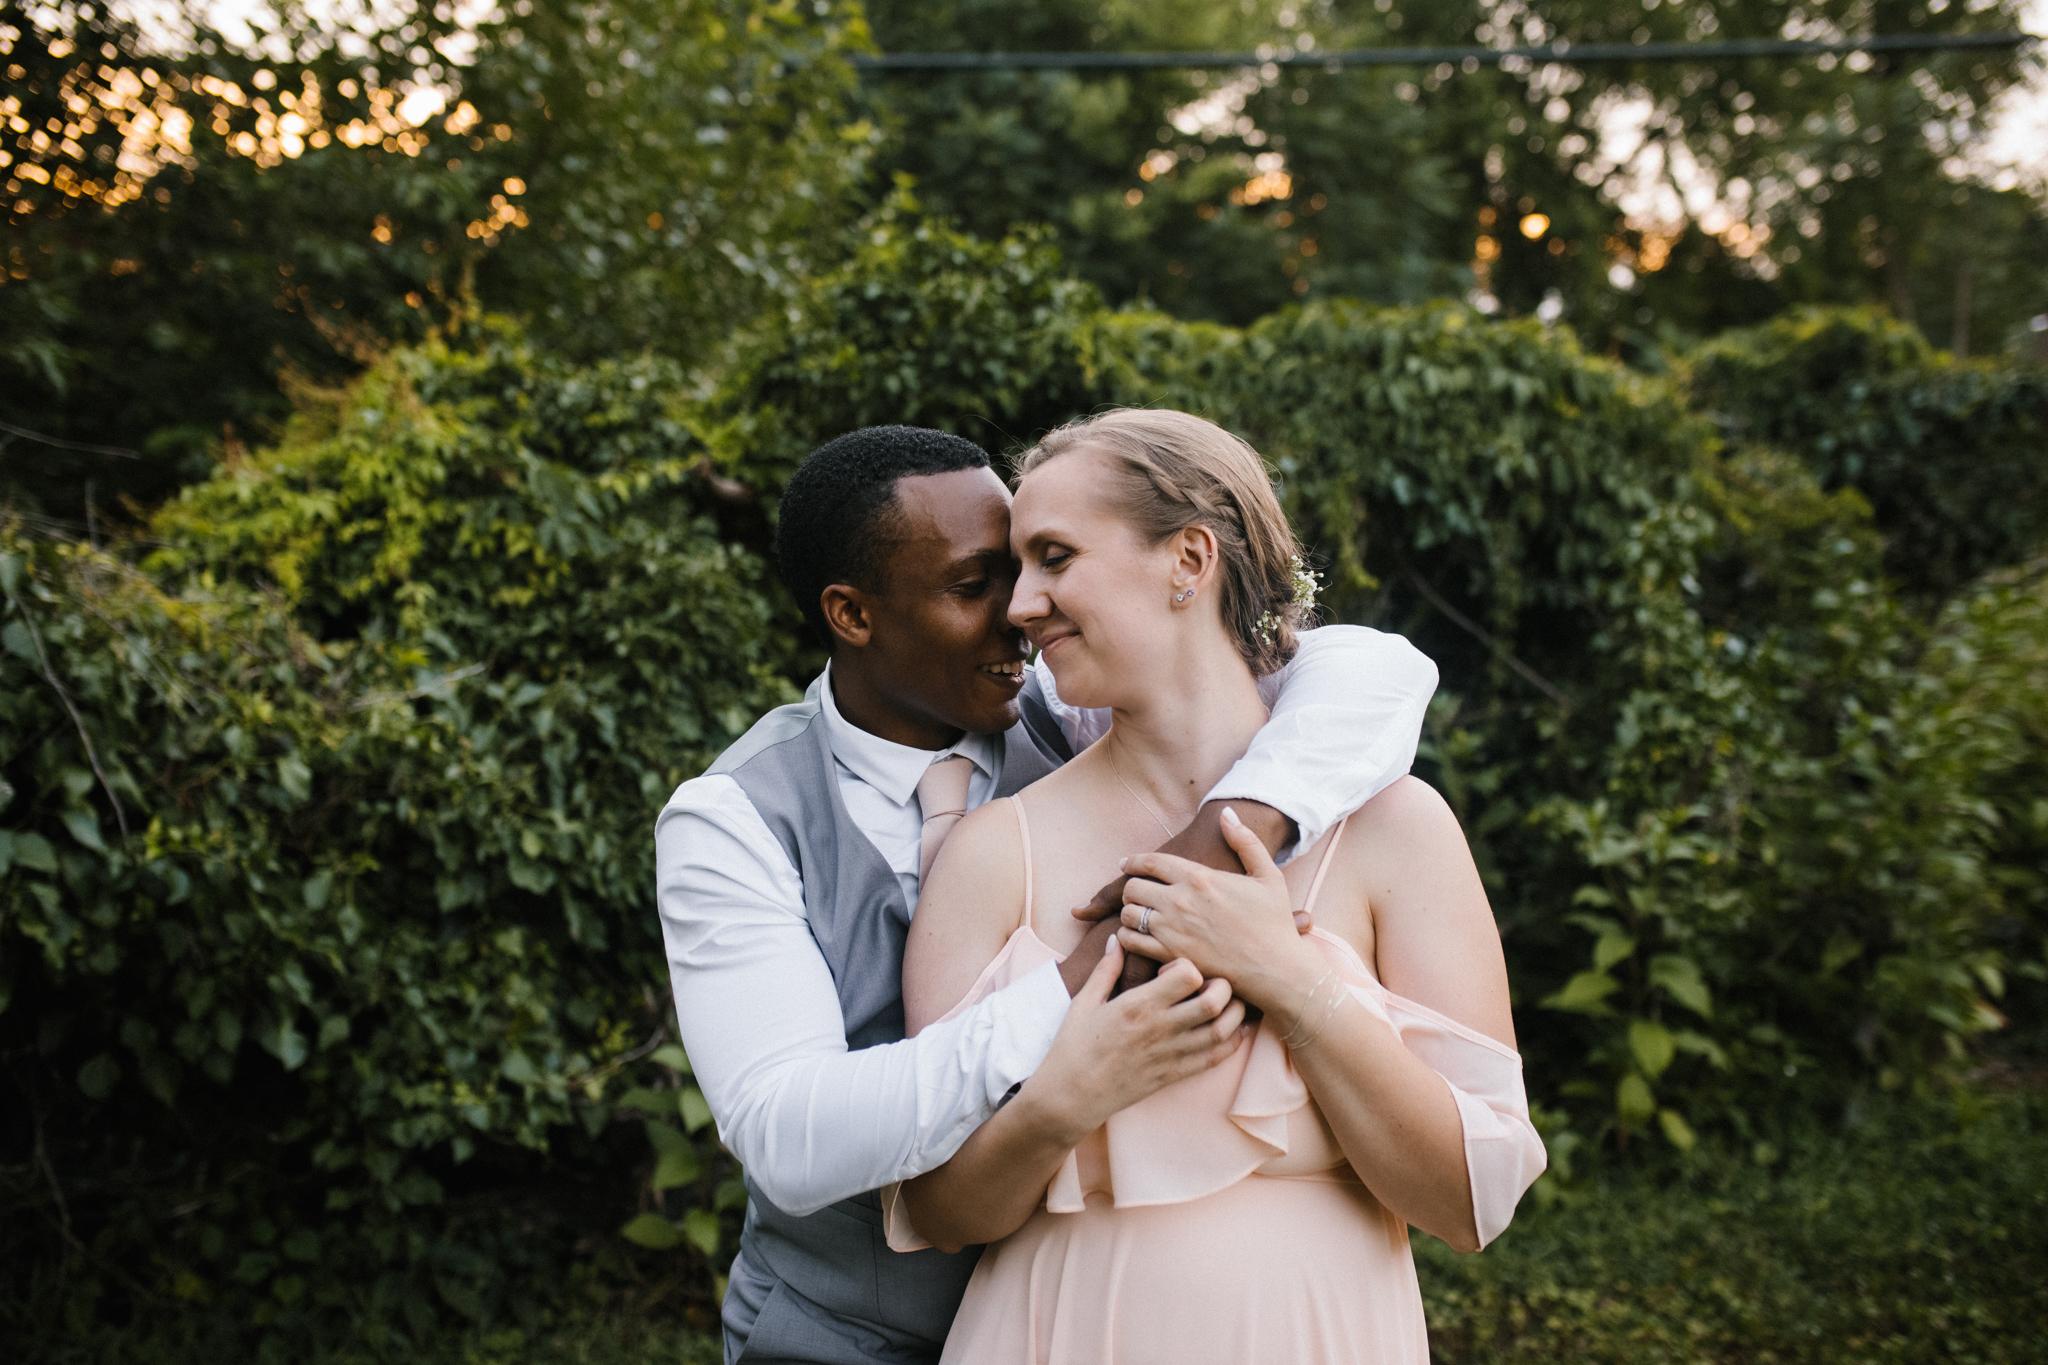 dorota_dwight_richmond_backyard_wedding-85.jpg